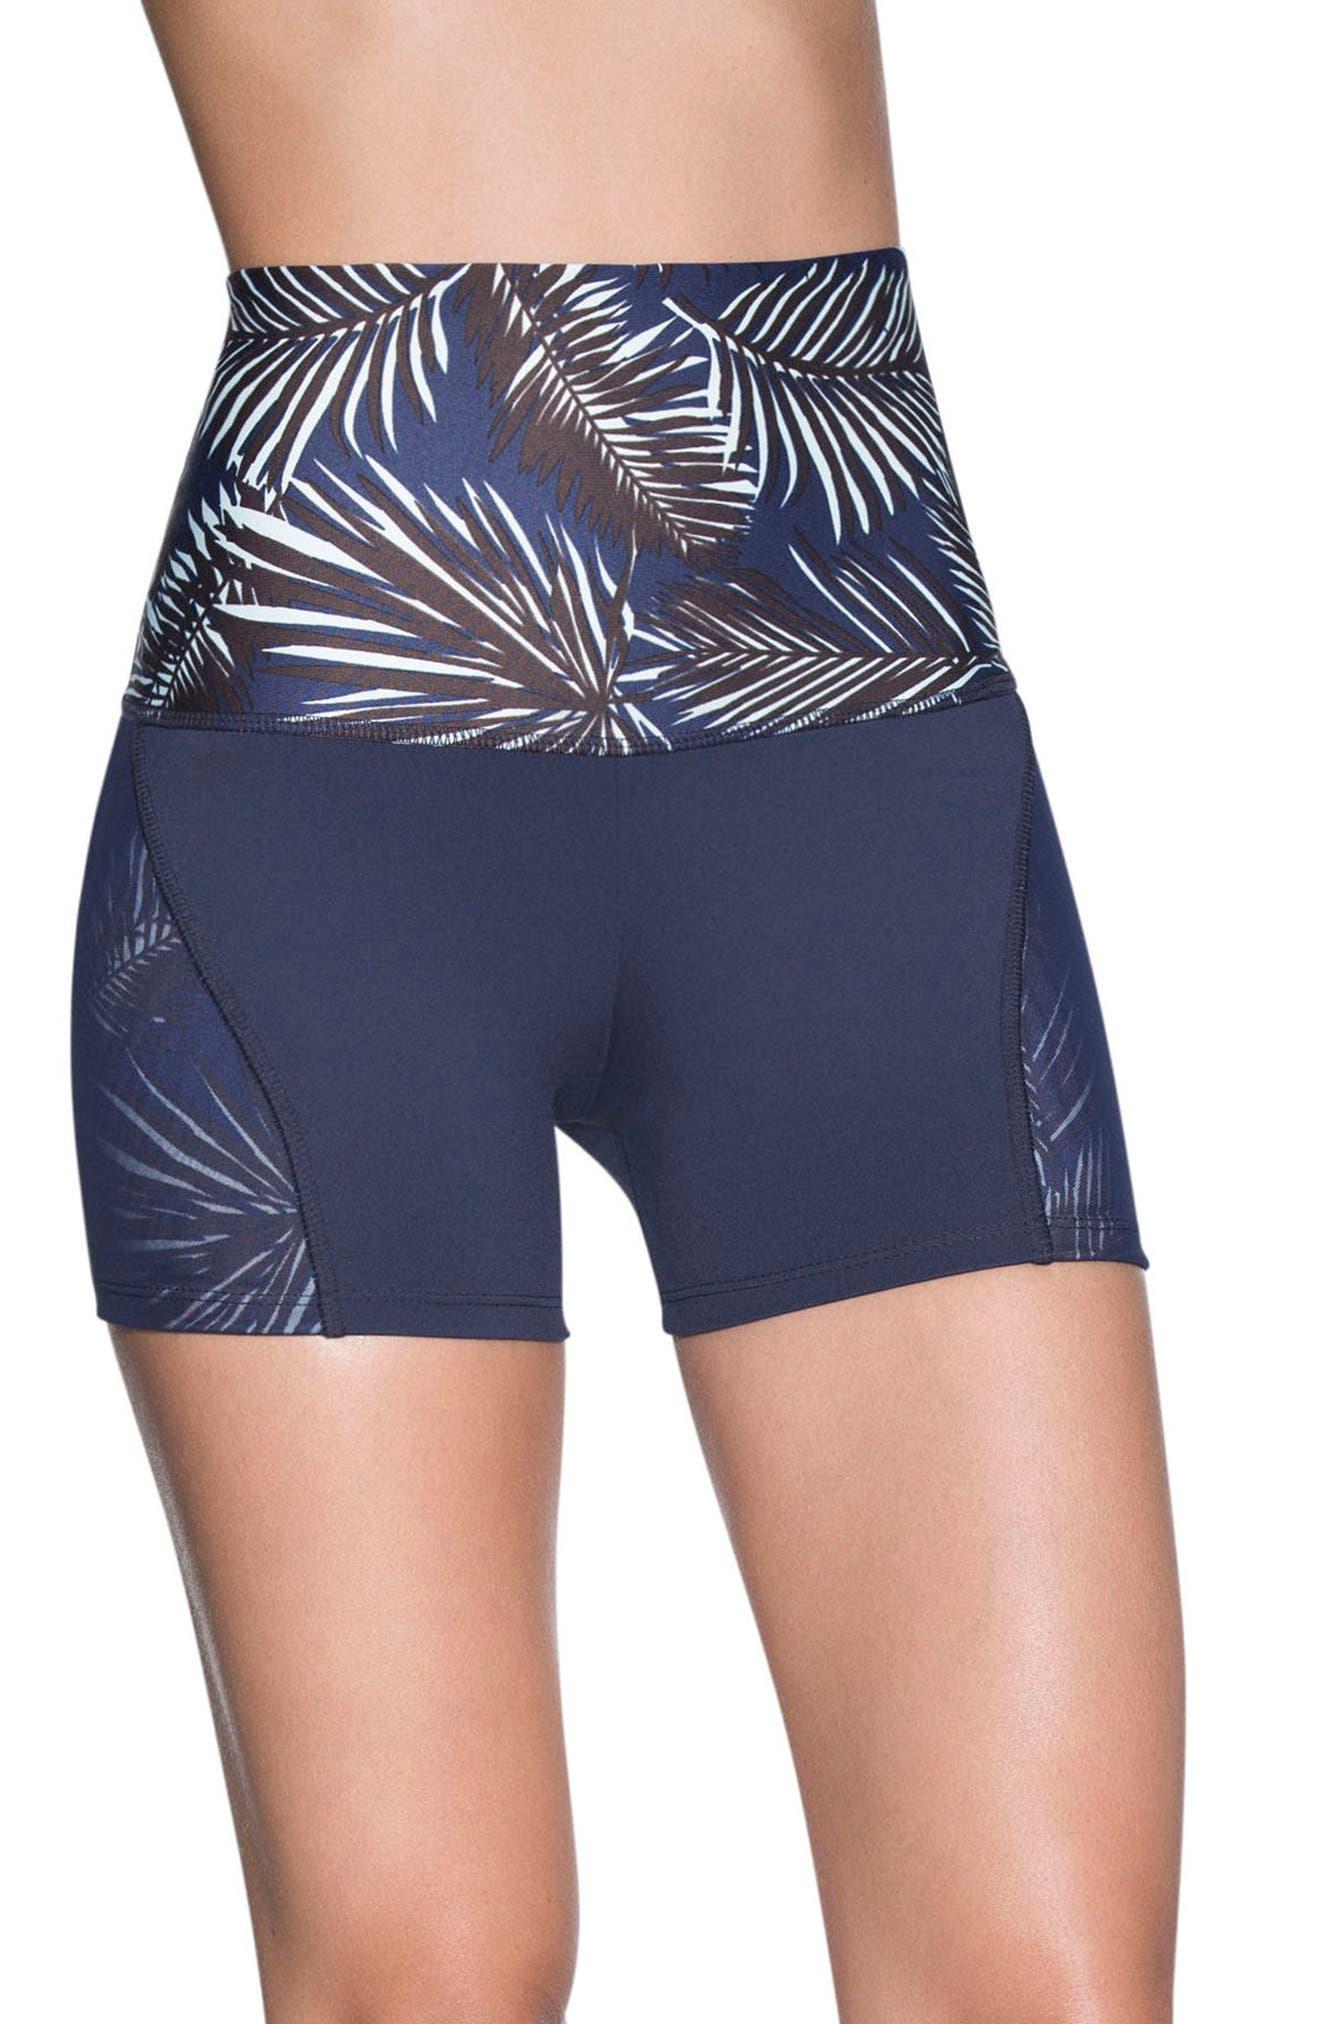 Cobra High Waist Shorts,                             Main thumbnail 1, color,                             Multicolor